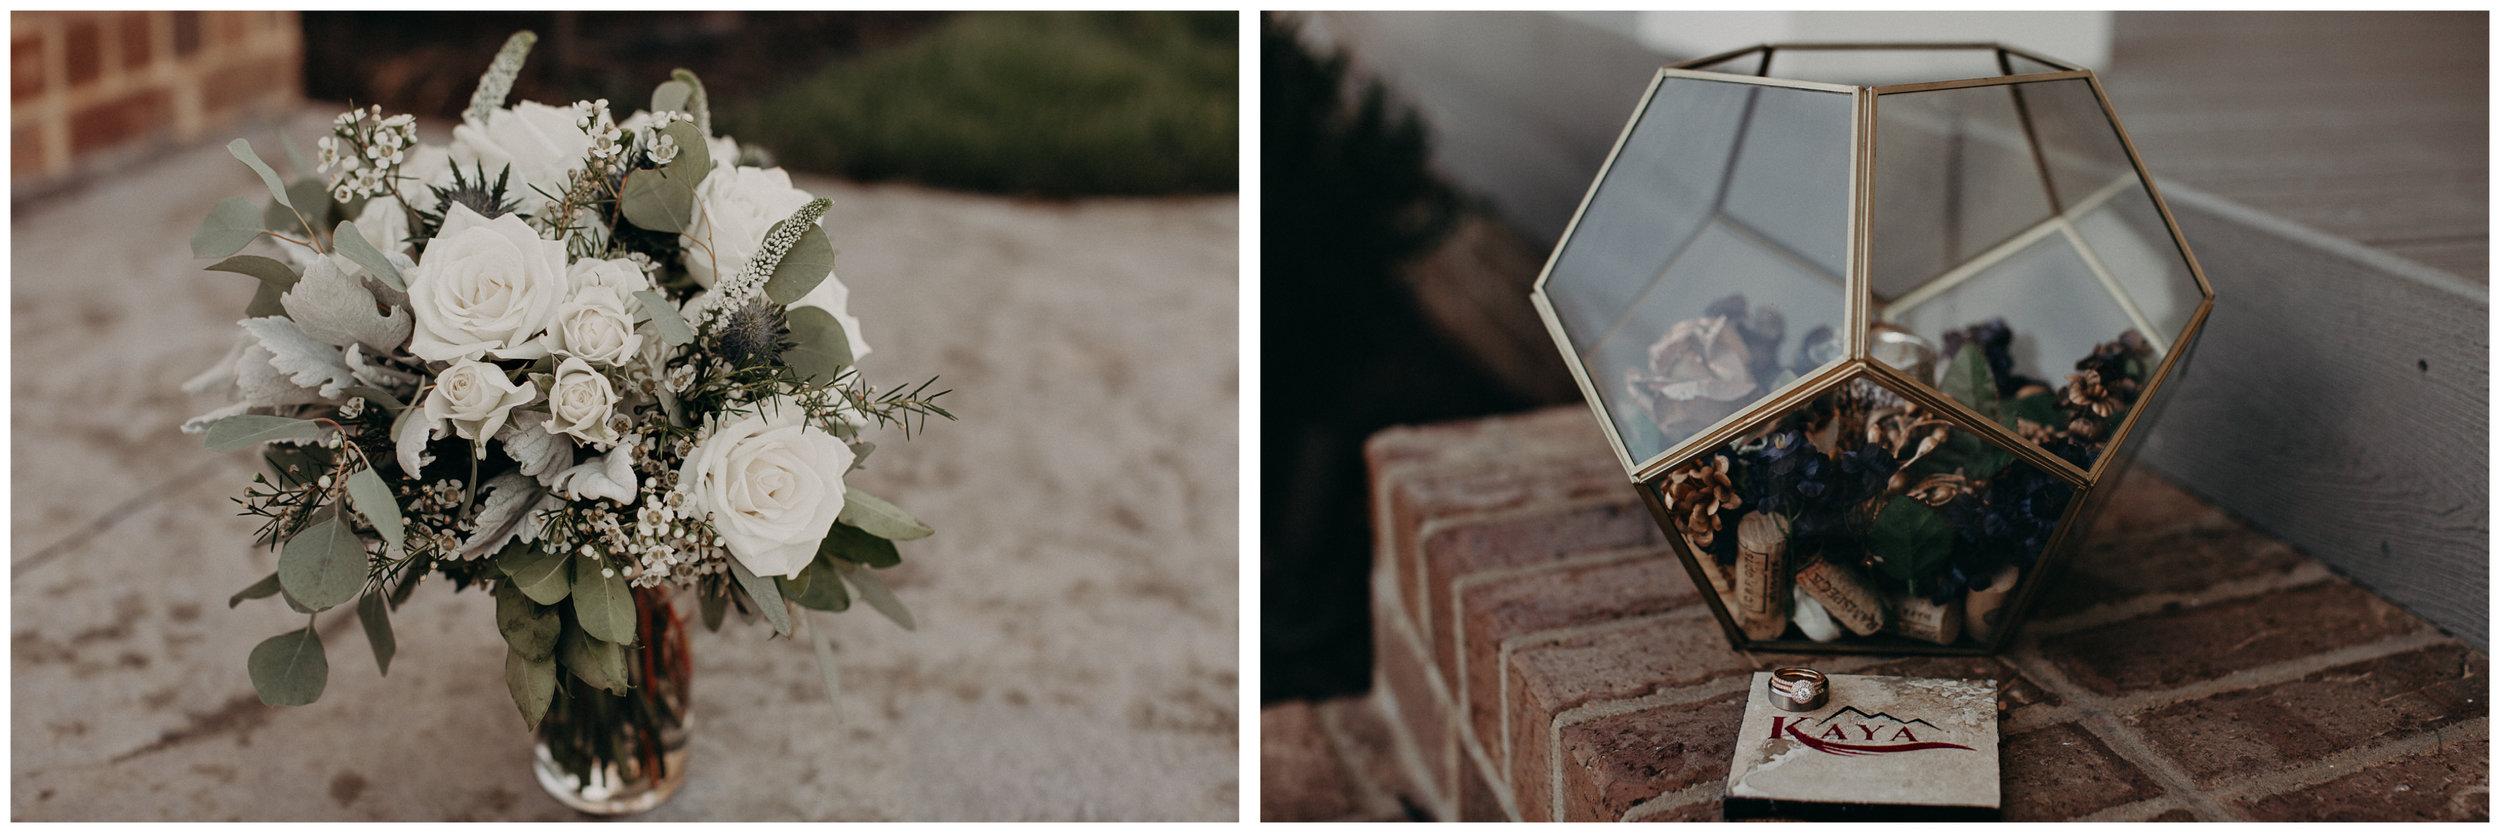 7- Wedding_day_atlanta_georgia_details_aline_marin_photography_wedding_photographer-3.jpg